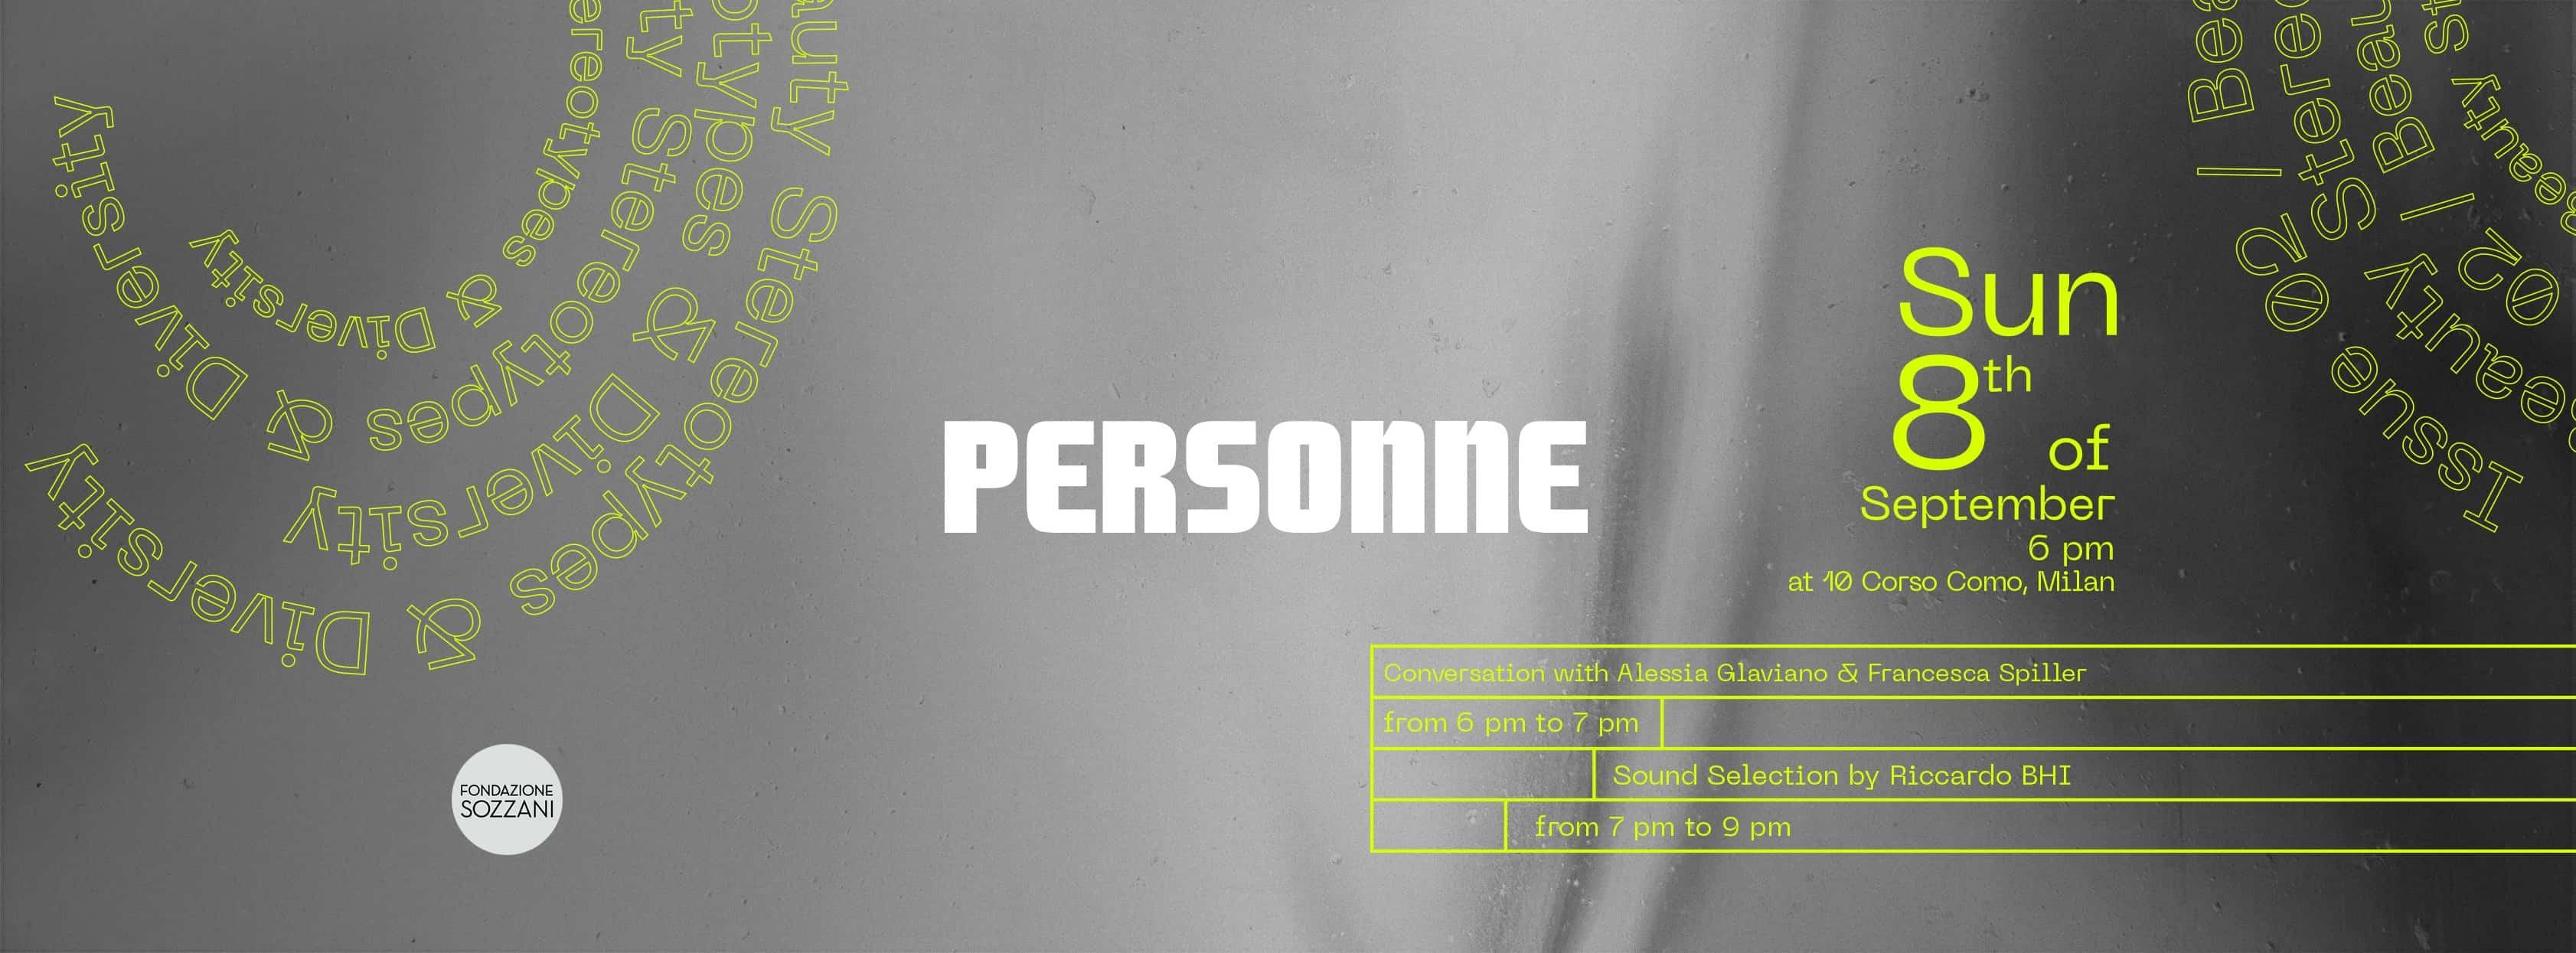 Personne: lancio del magazine con dj set in Corso Como 10